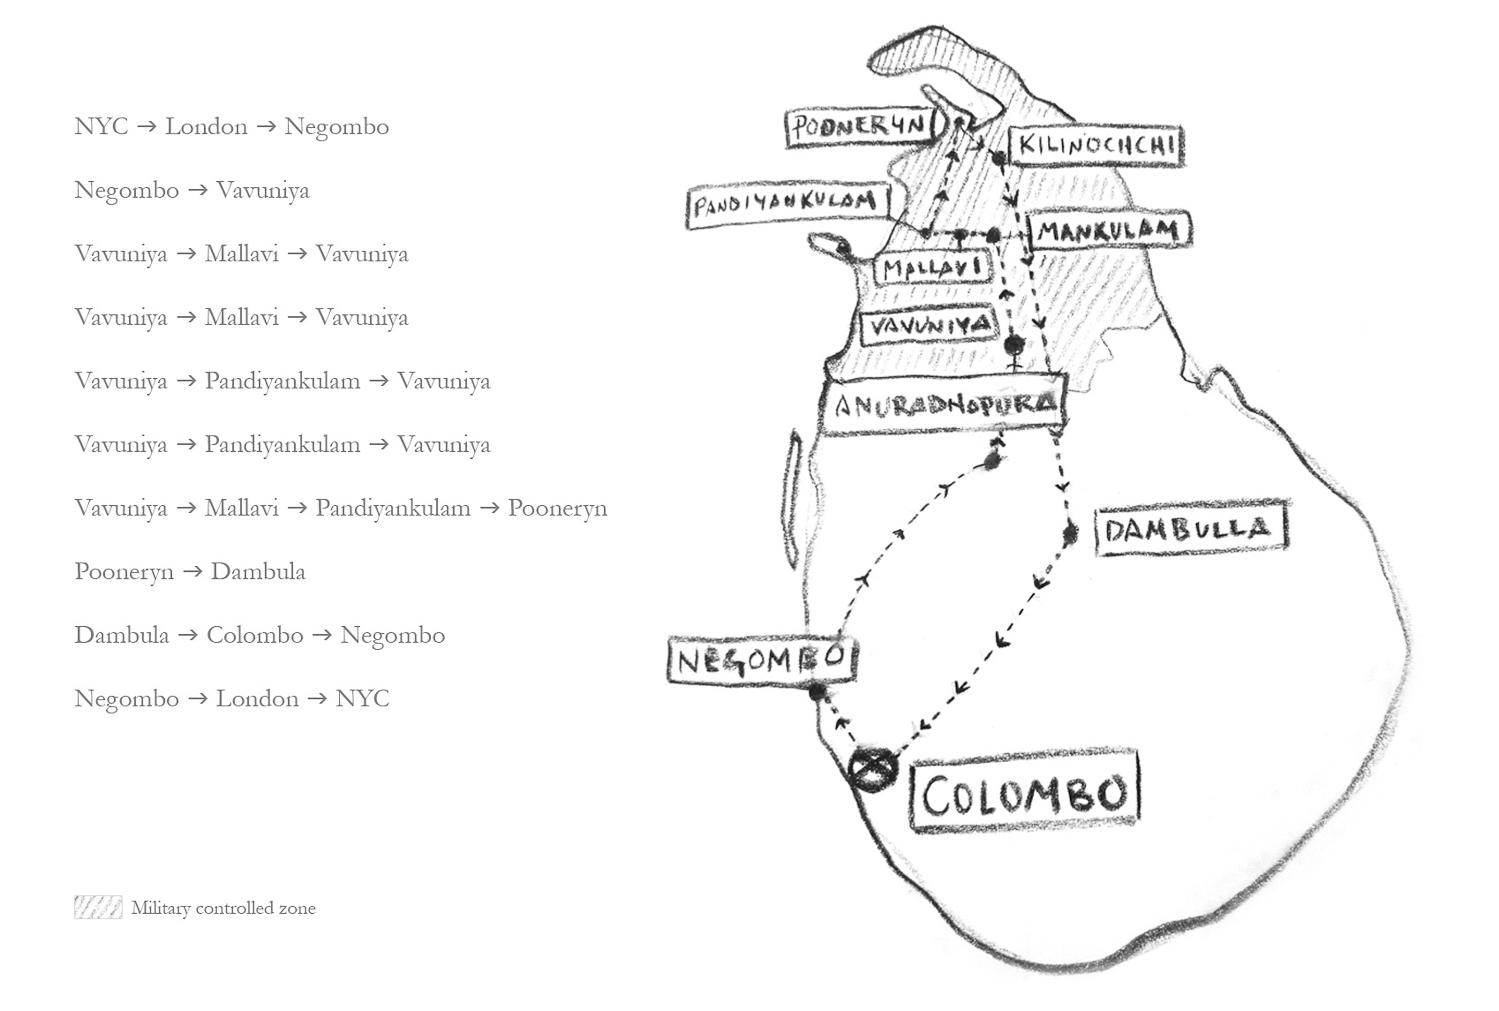 Map courtesy of  Sean A. Murray